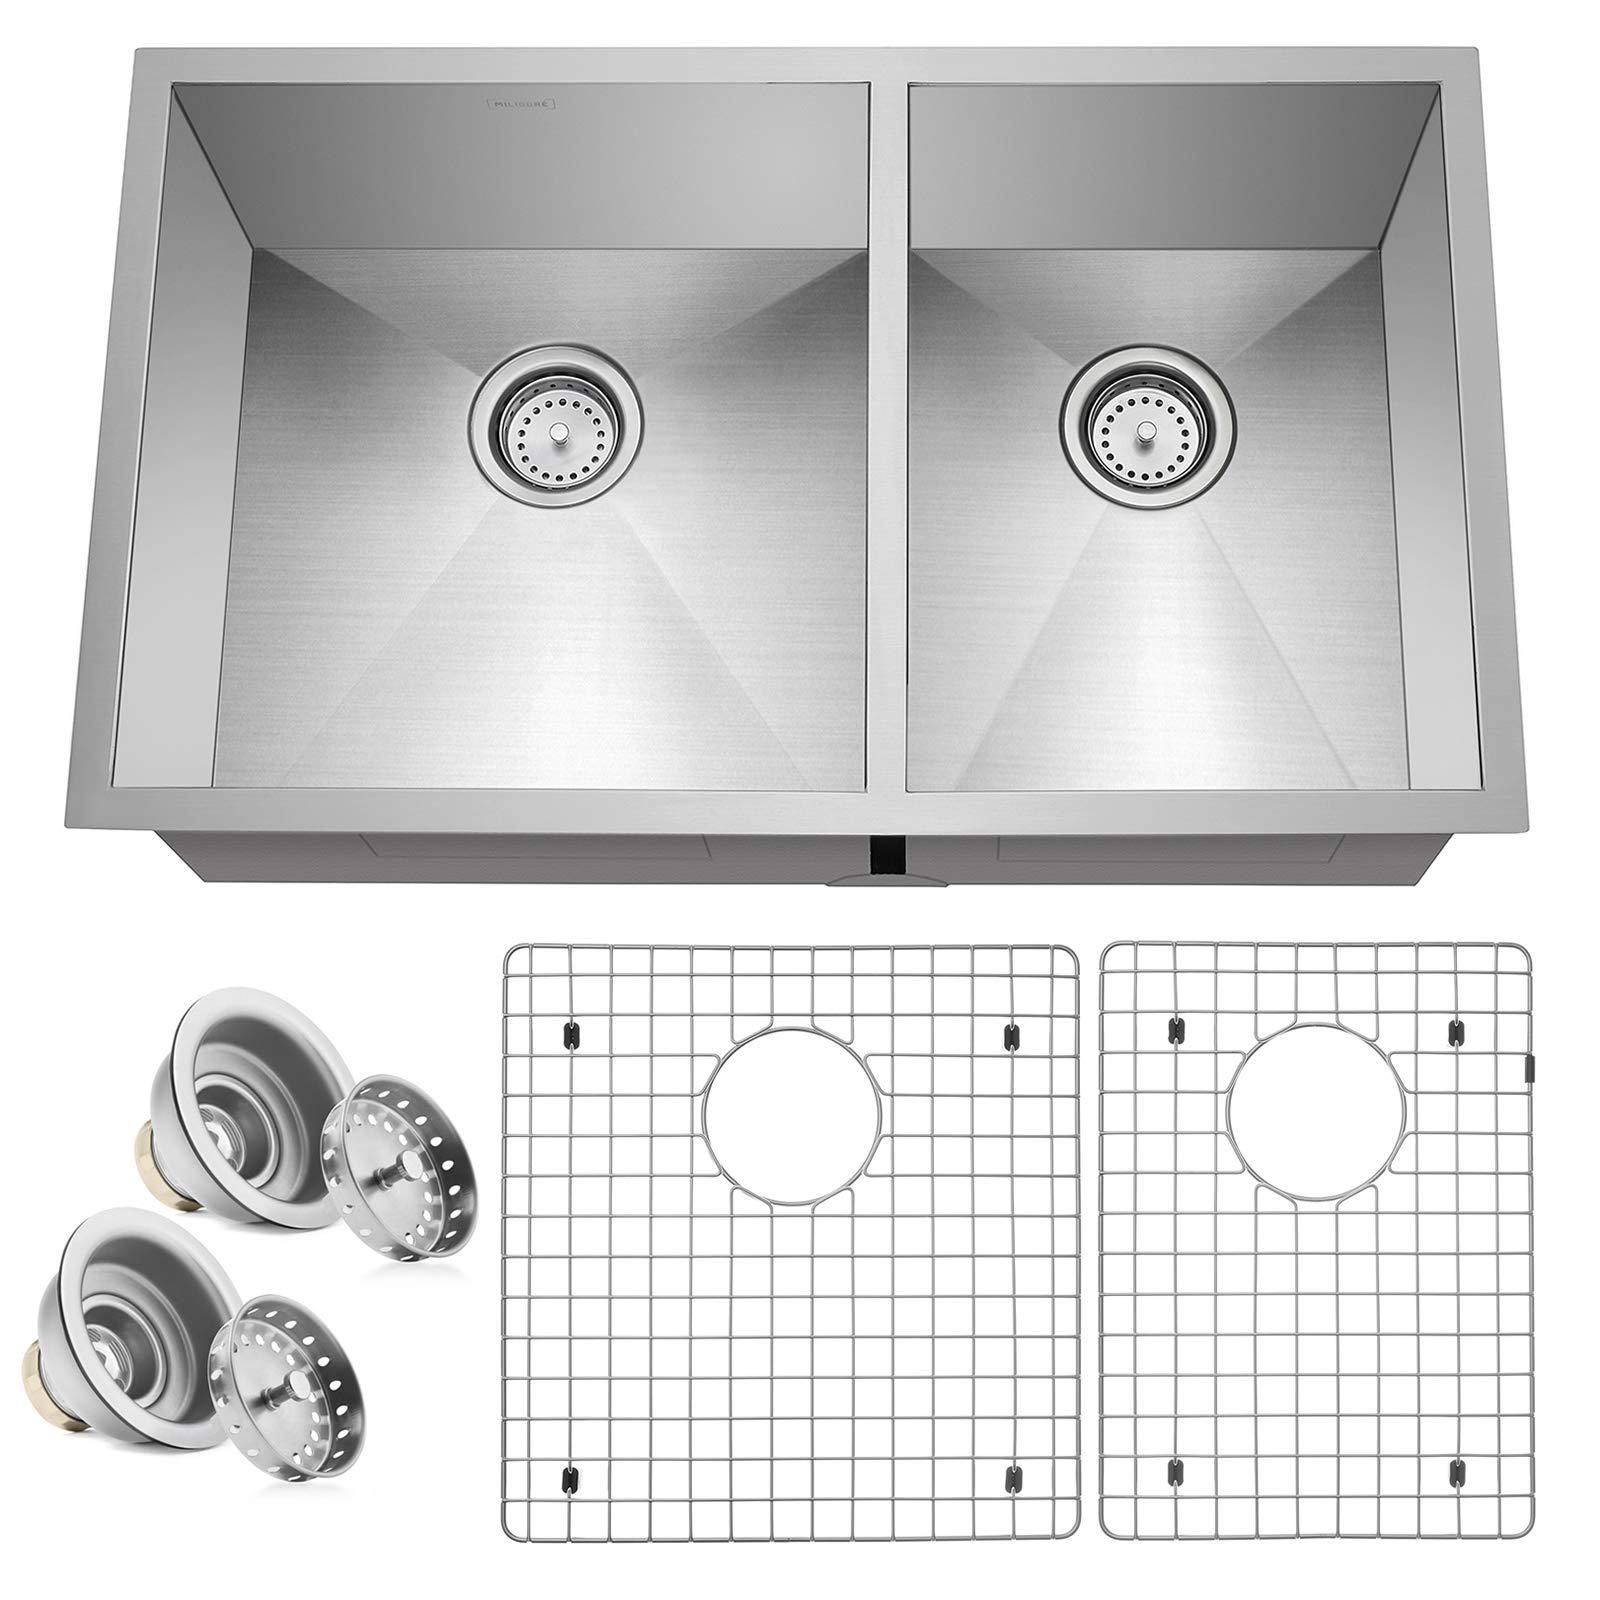 Miligore 32'' x 19'' x 10'' Deep Double Bowl (60/40 Split) Undermount Zero Radius 16-Gauge Stainless Steel Kitchen Sink - Includes Drains/Grids